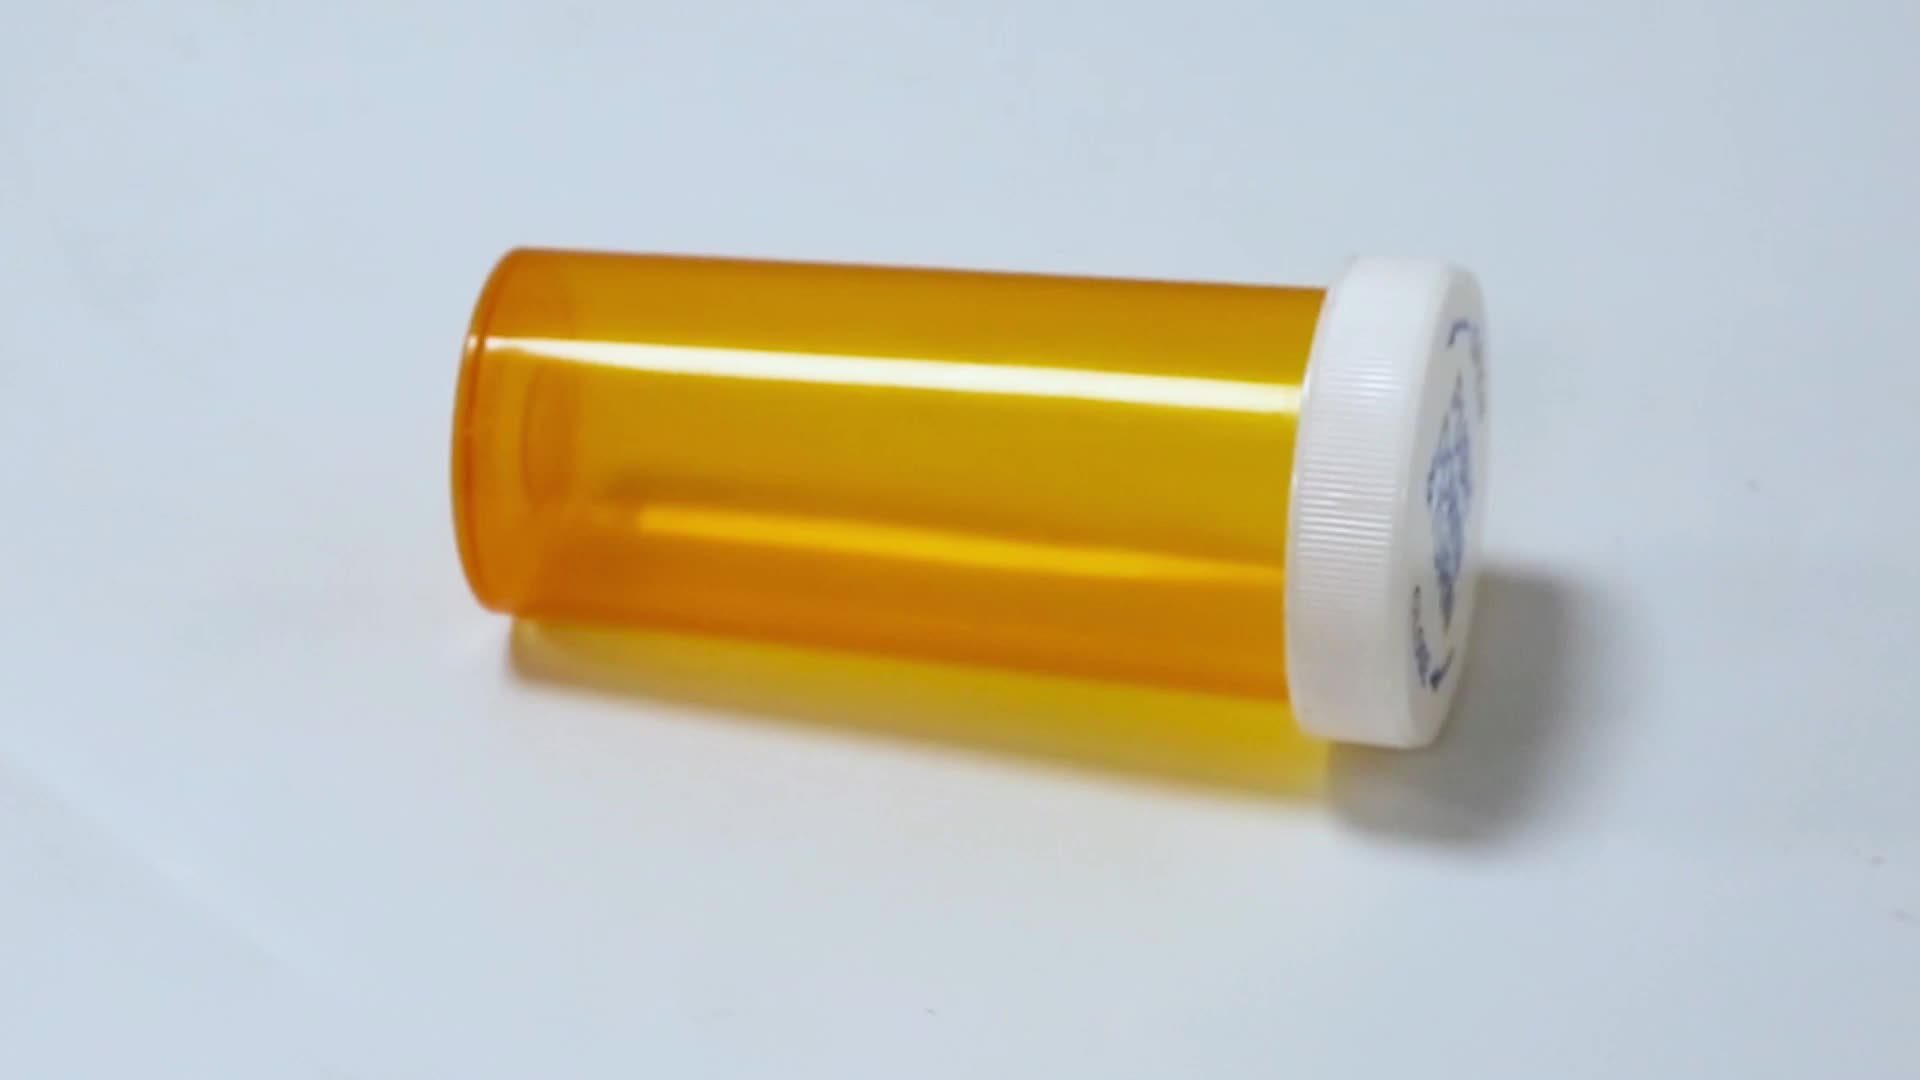 Garrafas plásticas de pílula laranja